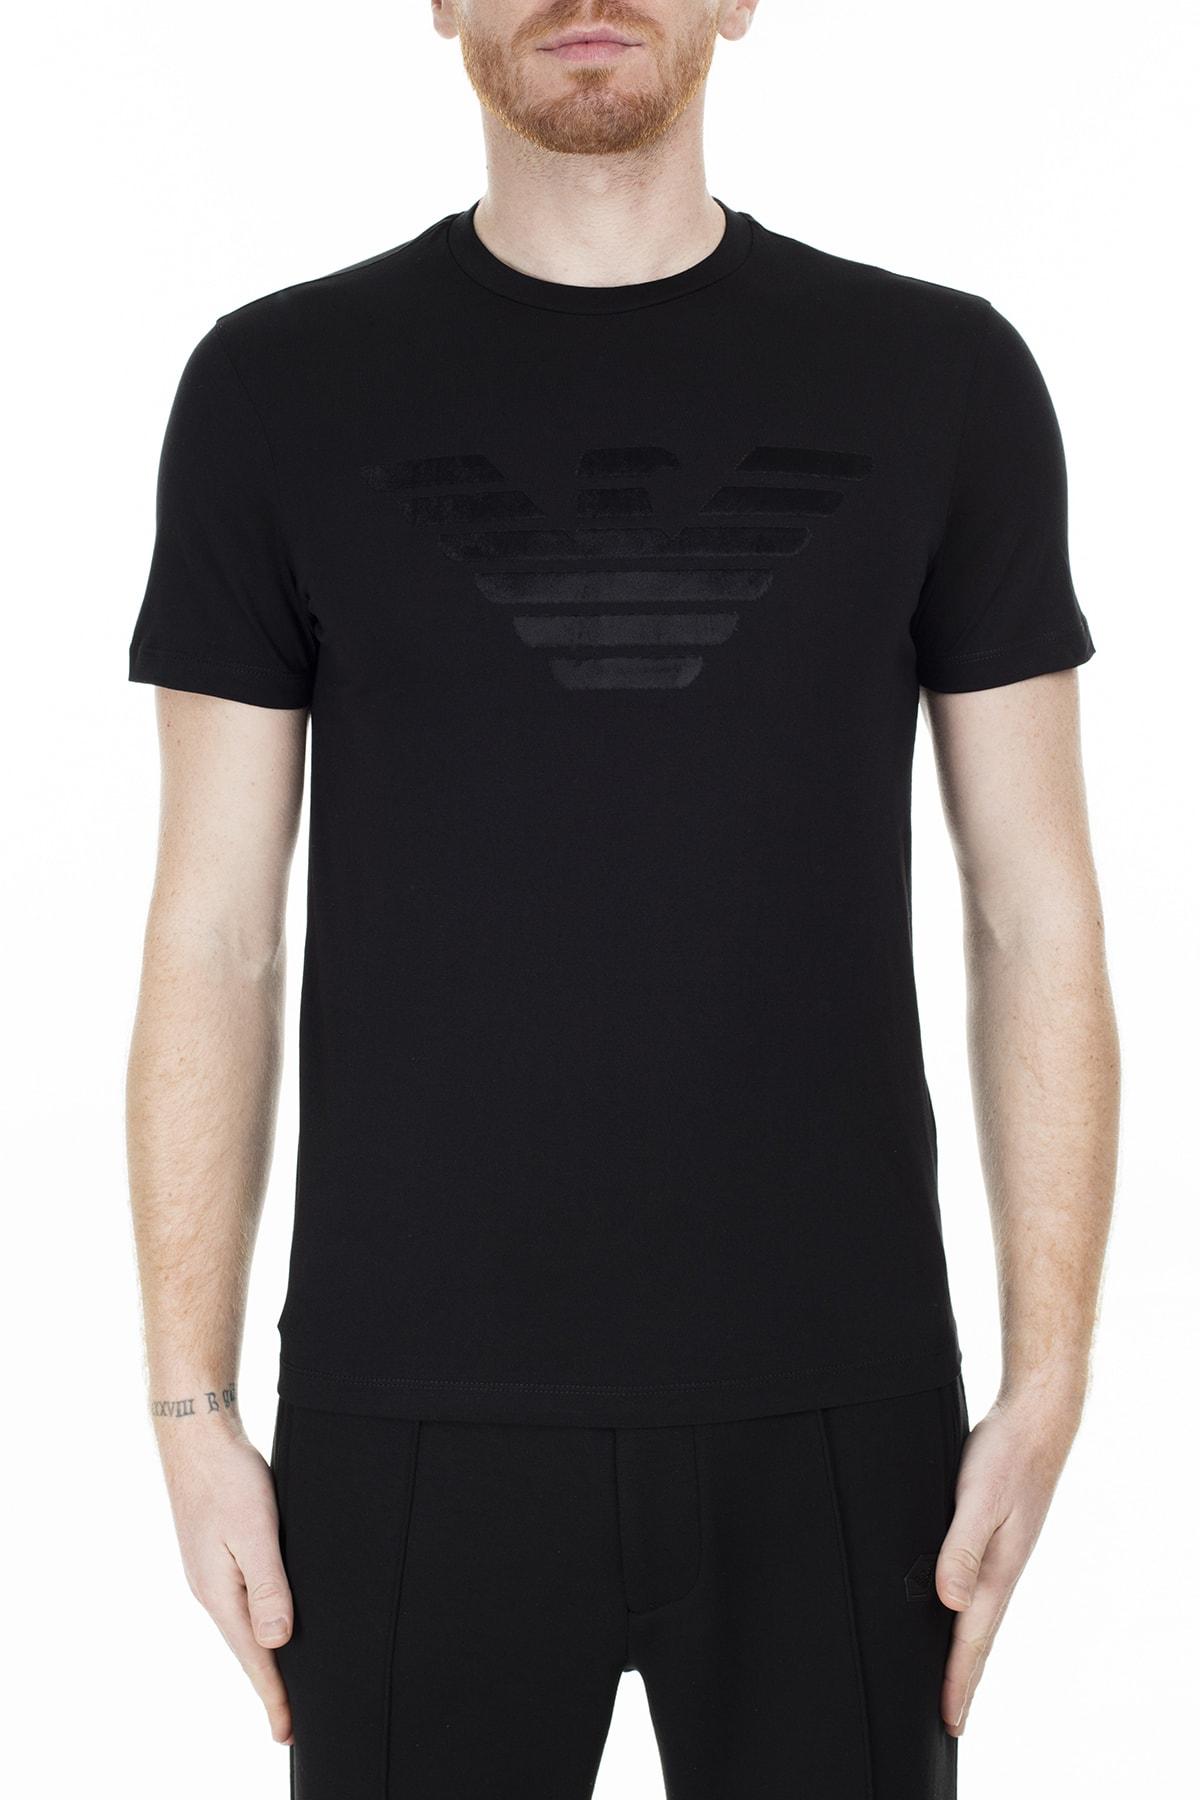 Emporio Armani Regular Fit T Shirt Erkek T Shirt S 6G1Te6 1J00Z 0999 S 6G1TE6 1J00Z 0999